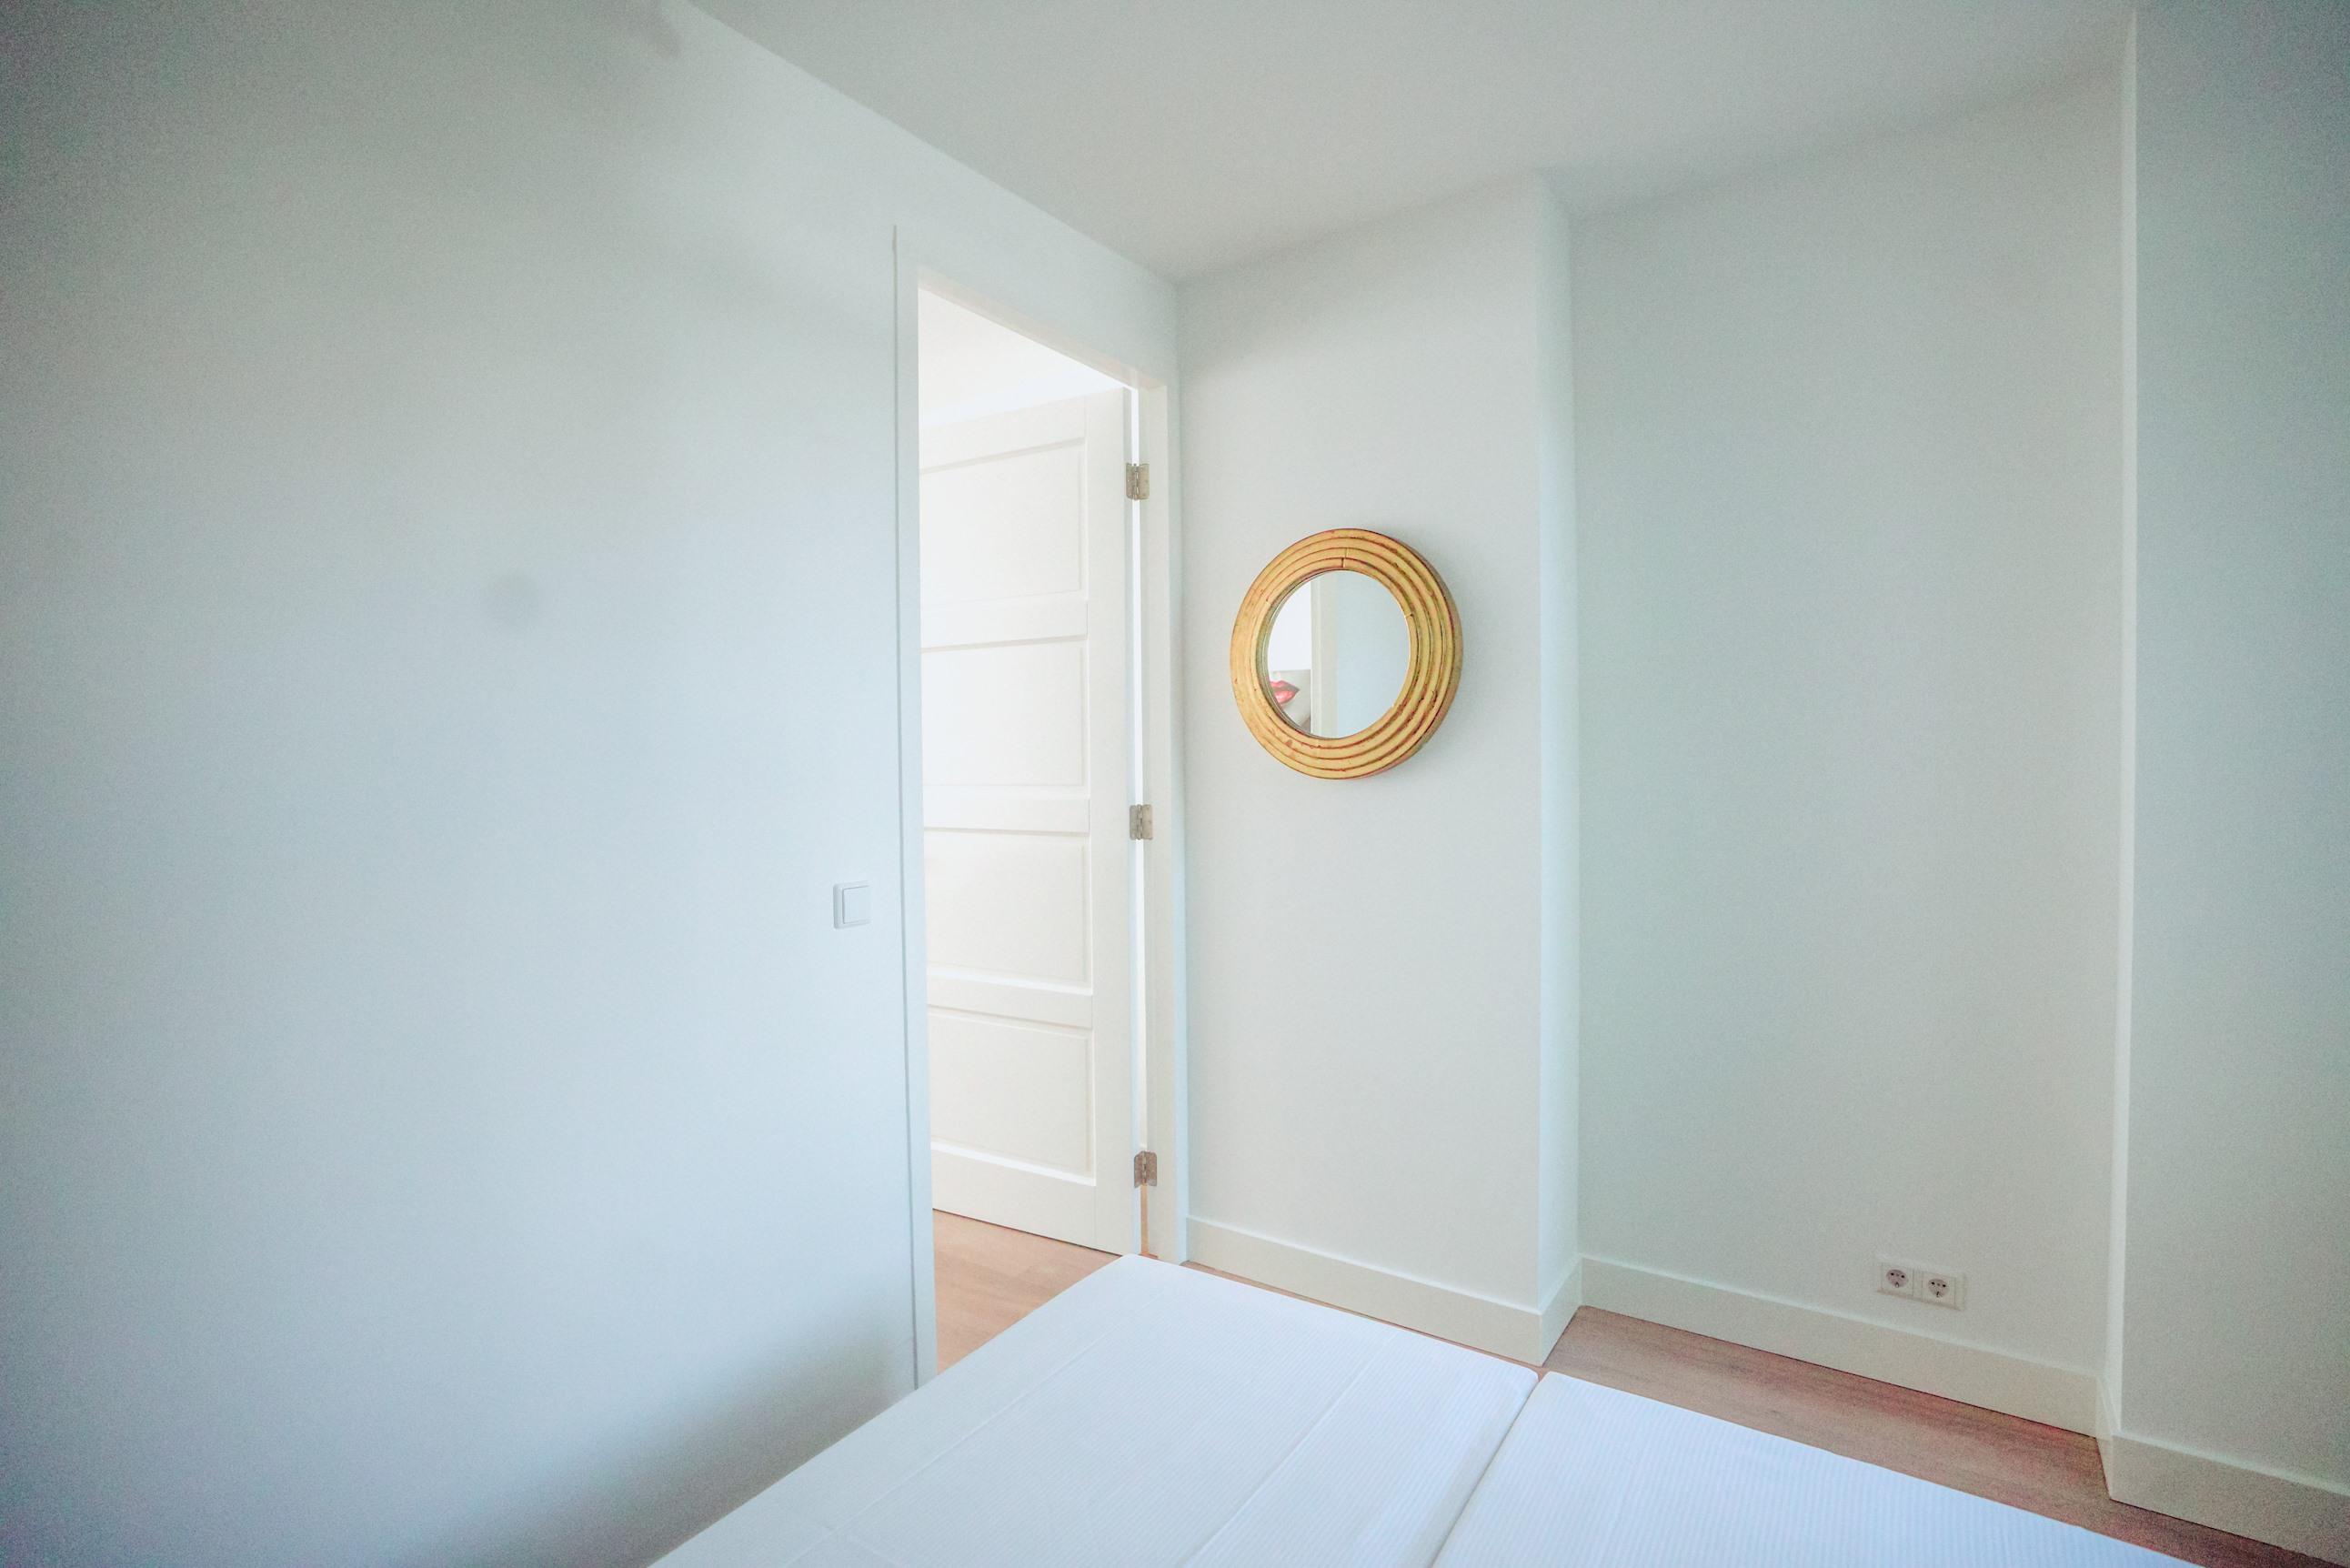 Amsterdam Apartments Leidsesquare First Floor Duplex photo 17002253